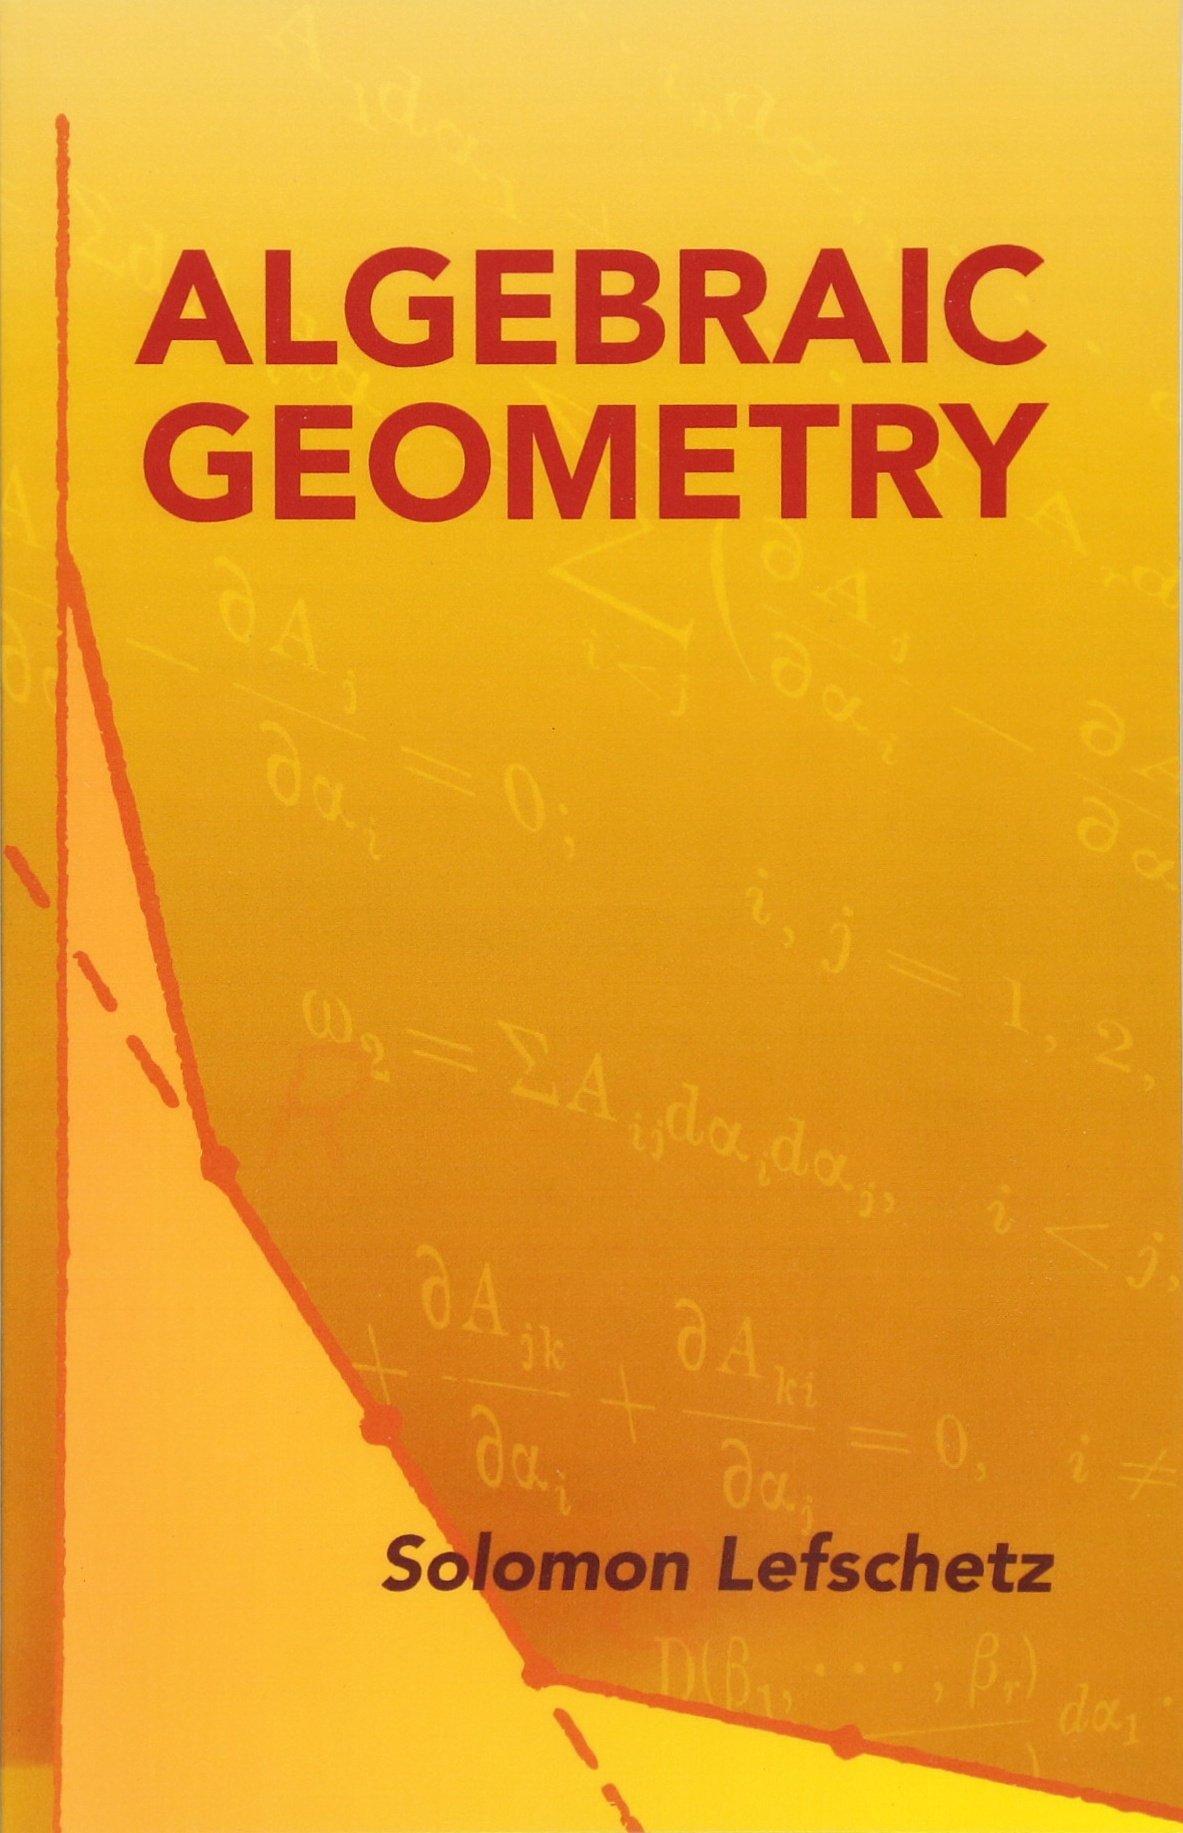 Download Algebraic Geometry (Dover Books on Mathematics) pdf